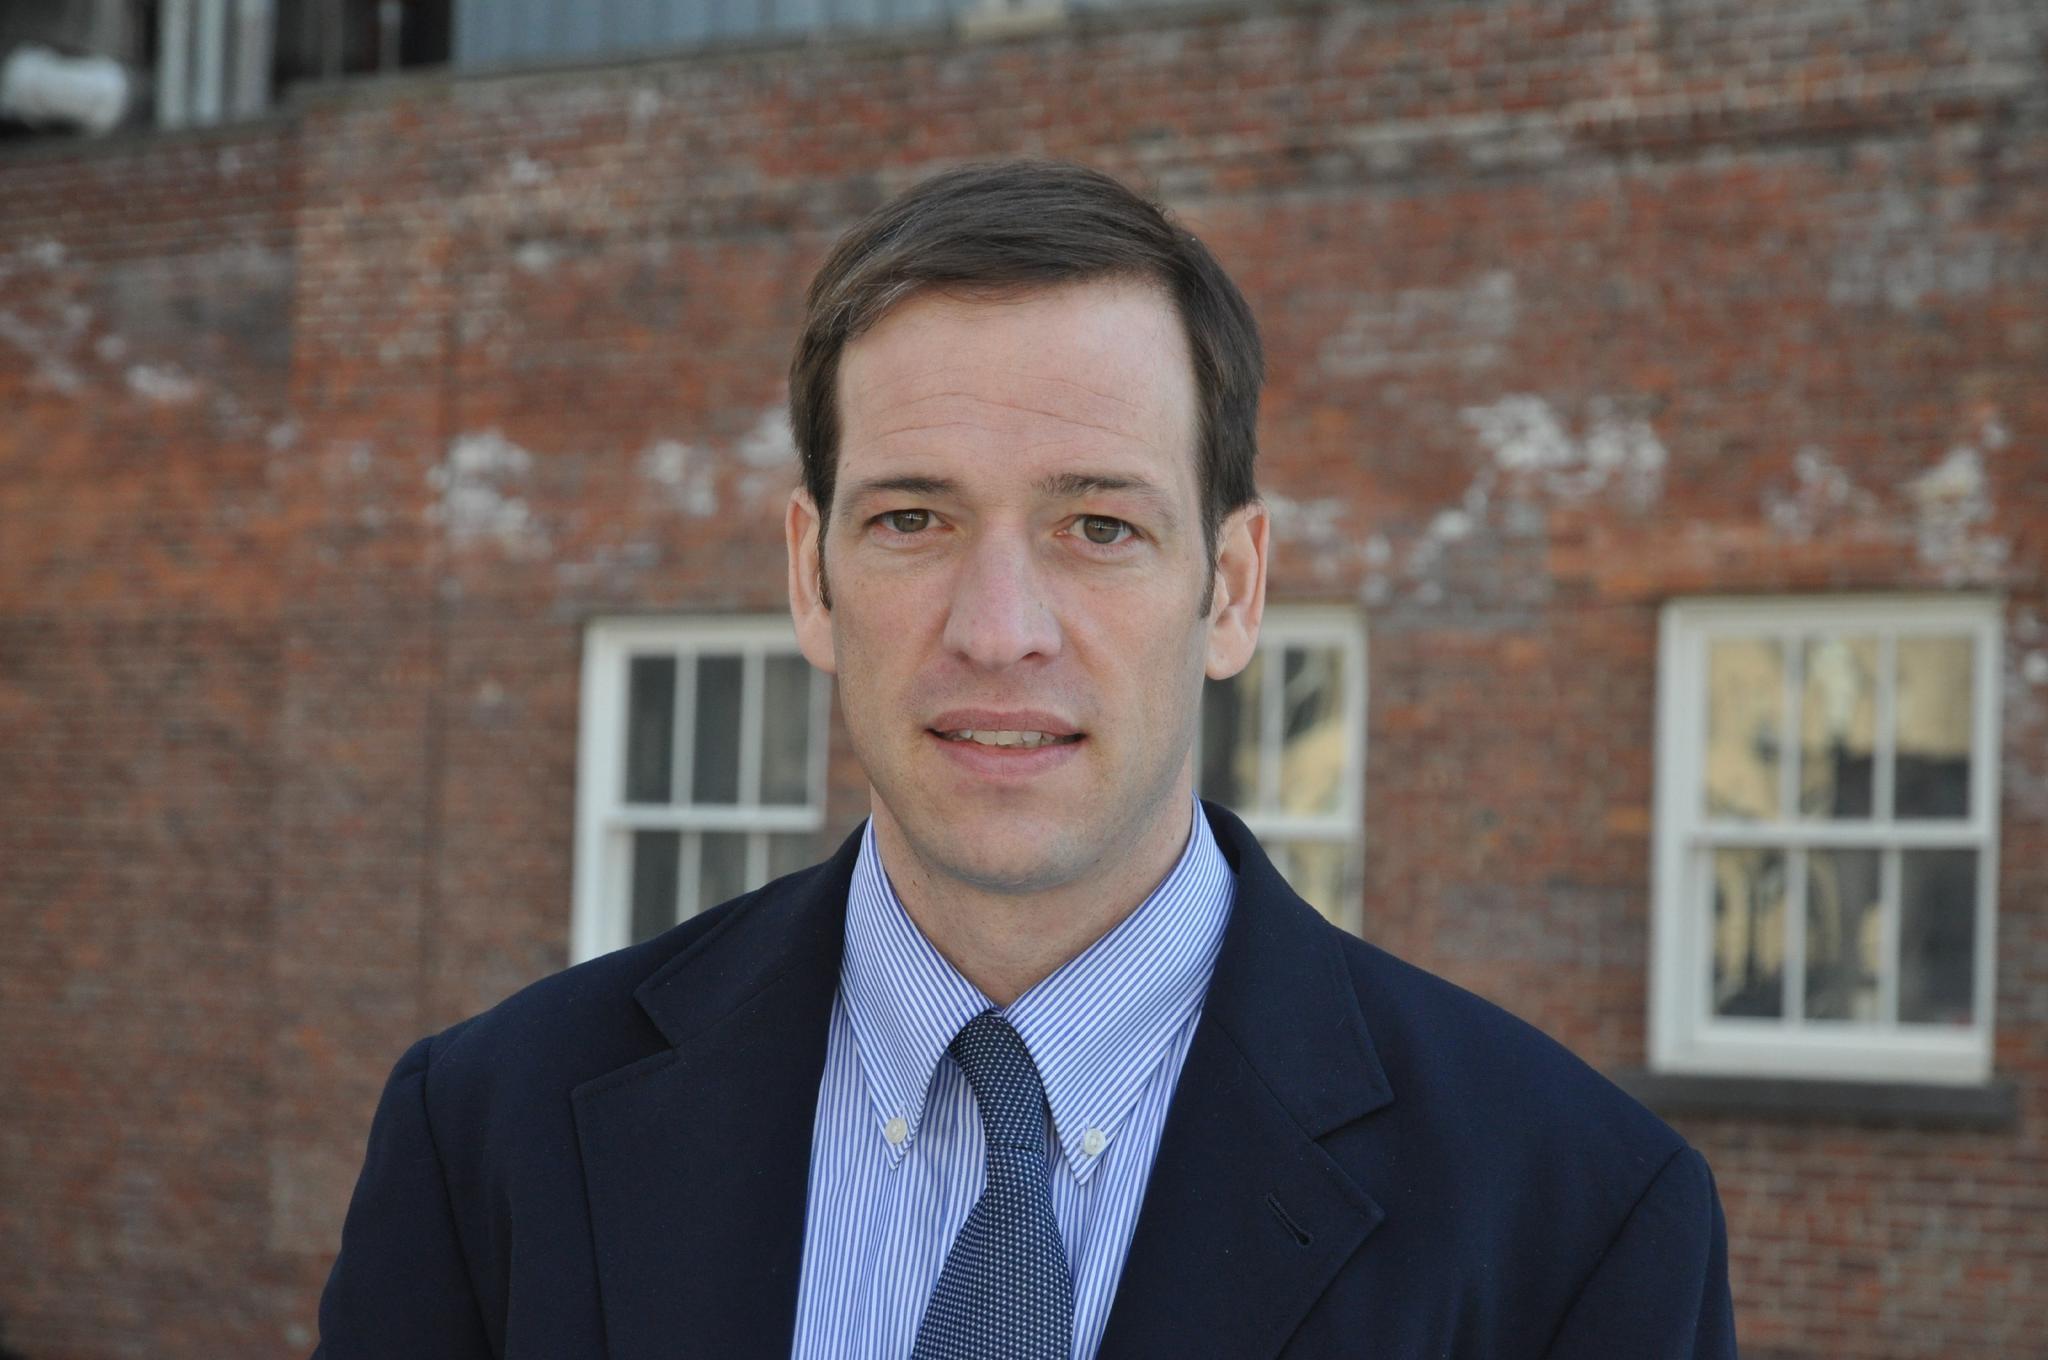 Joseph Ackroyd, P.E., CFM